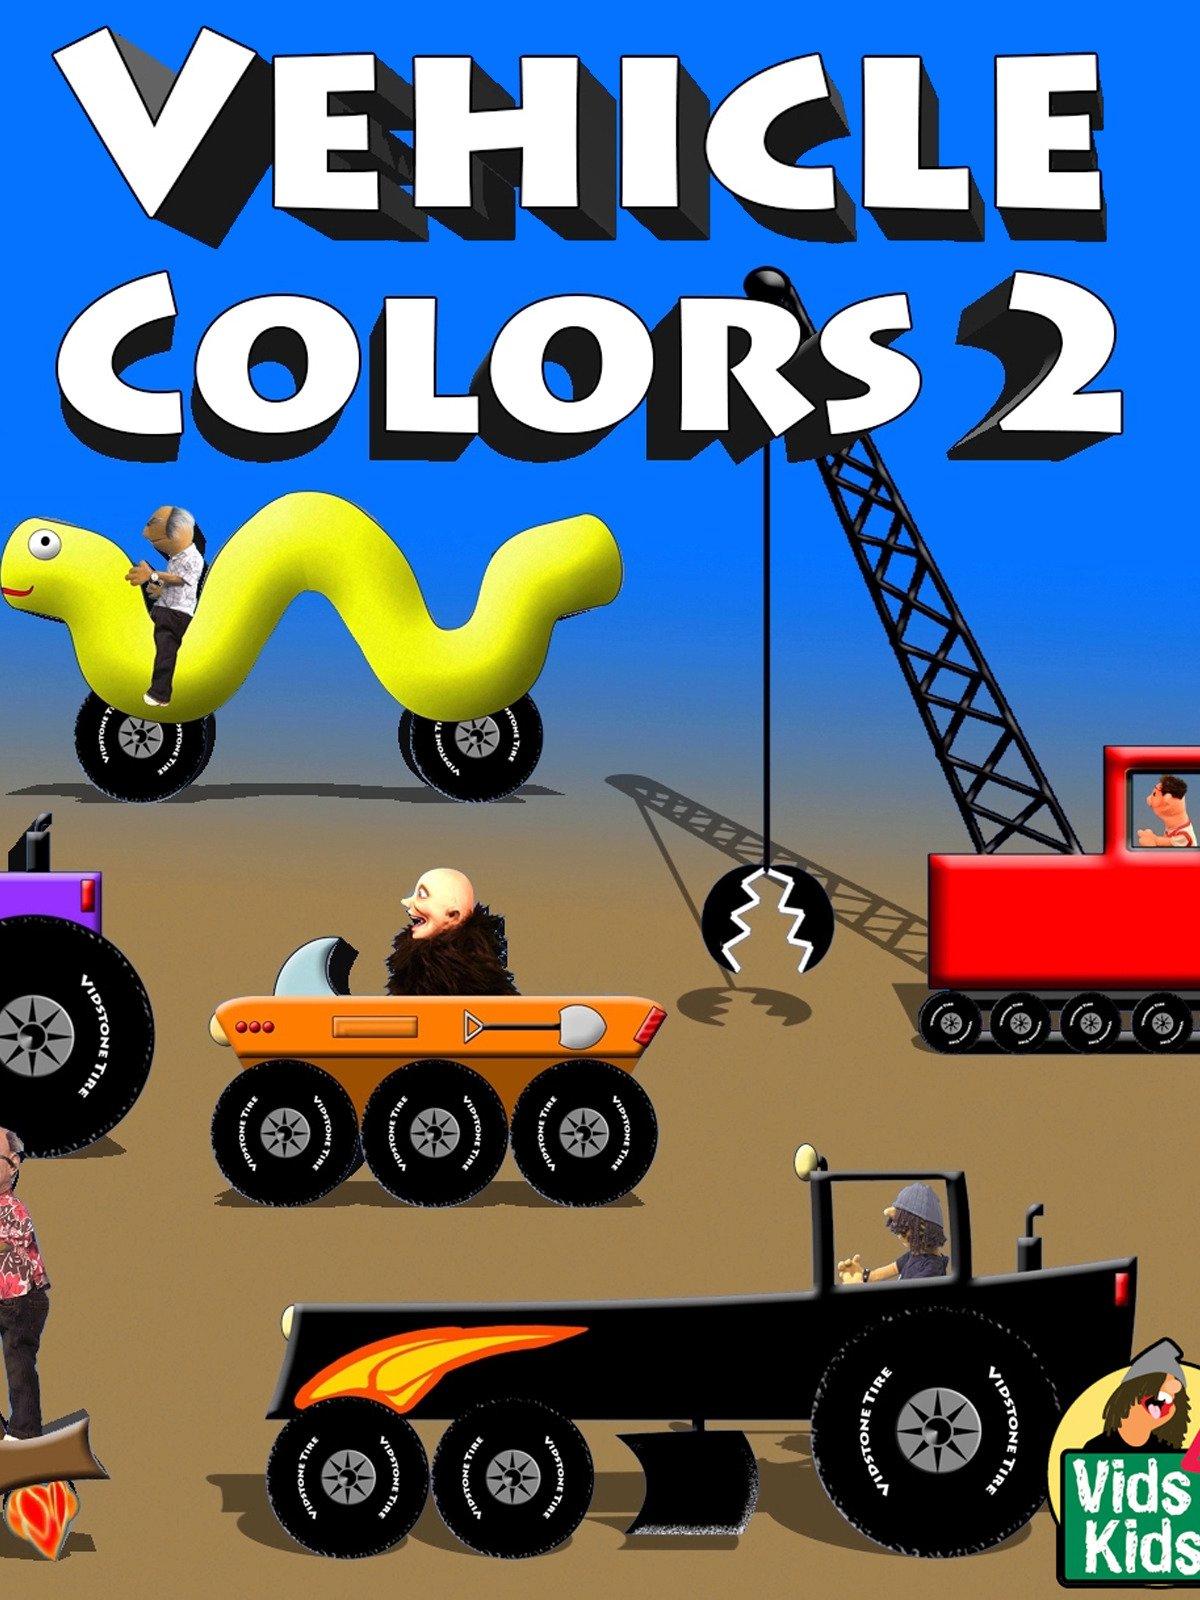 Vehicle Colors 2 on Amazon Prime Video UK